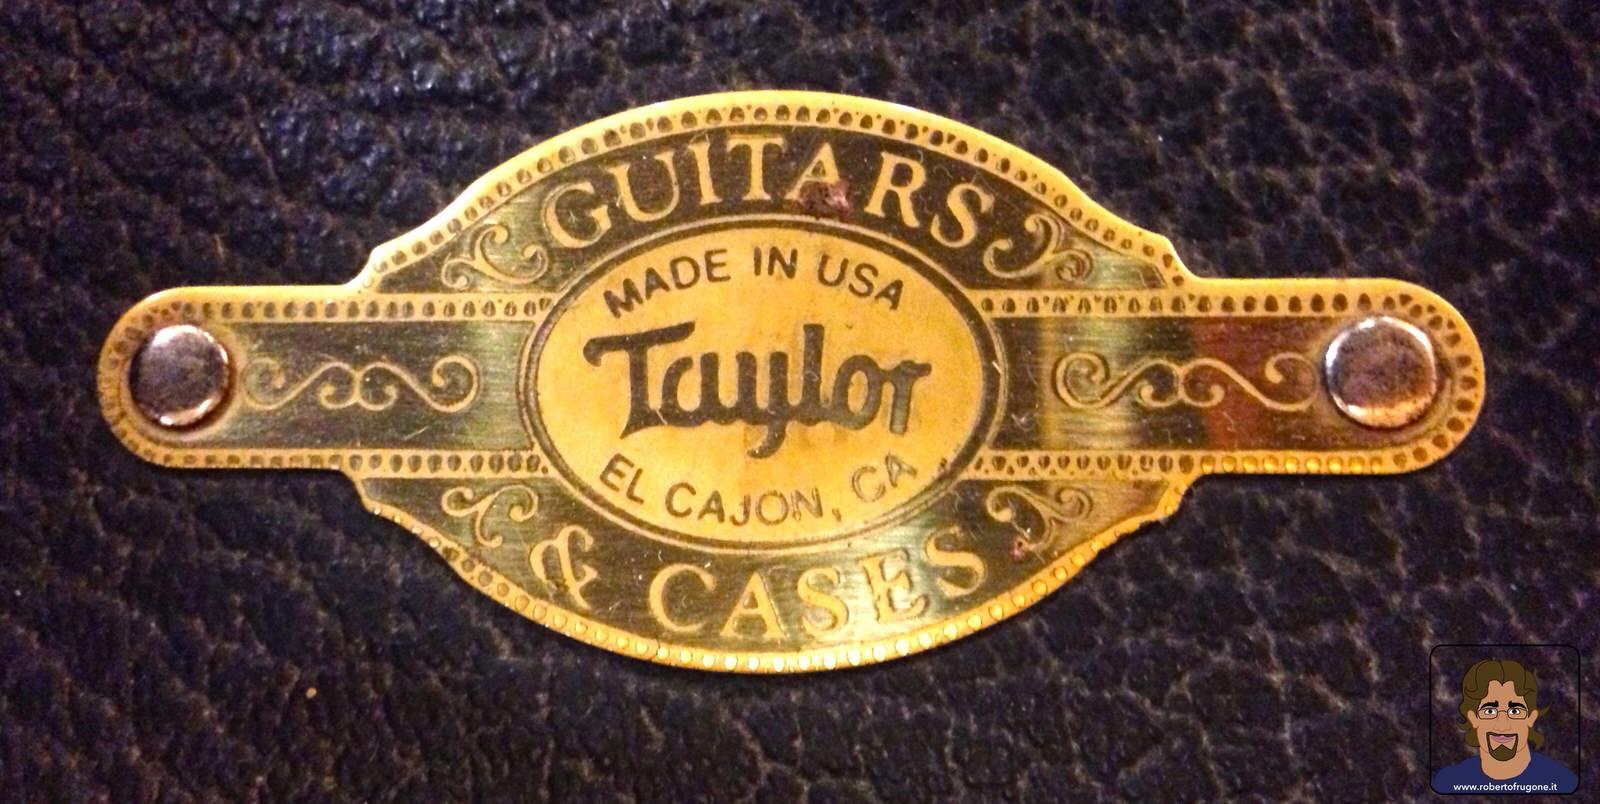 Totem Studio Sala Prove Musicali Casarza Ligure brand Taylor Guitars